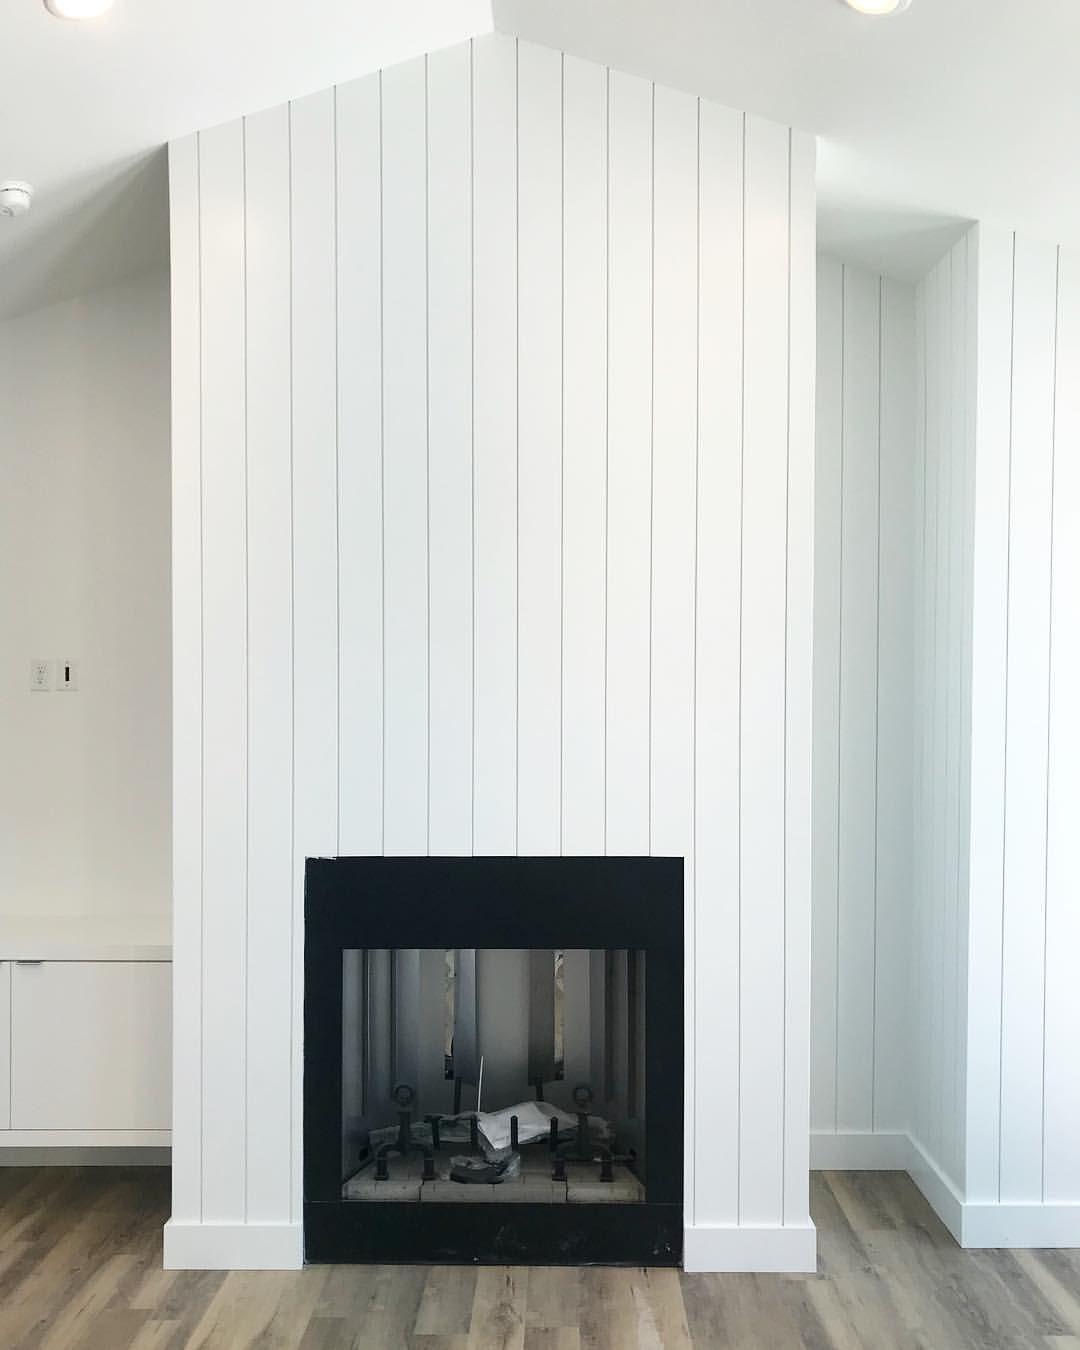 Vertical Shiplap In Benjaminmoore Chantillylace For This Fireplace Home Fireplace Fireplace Fireplace Modern Design